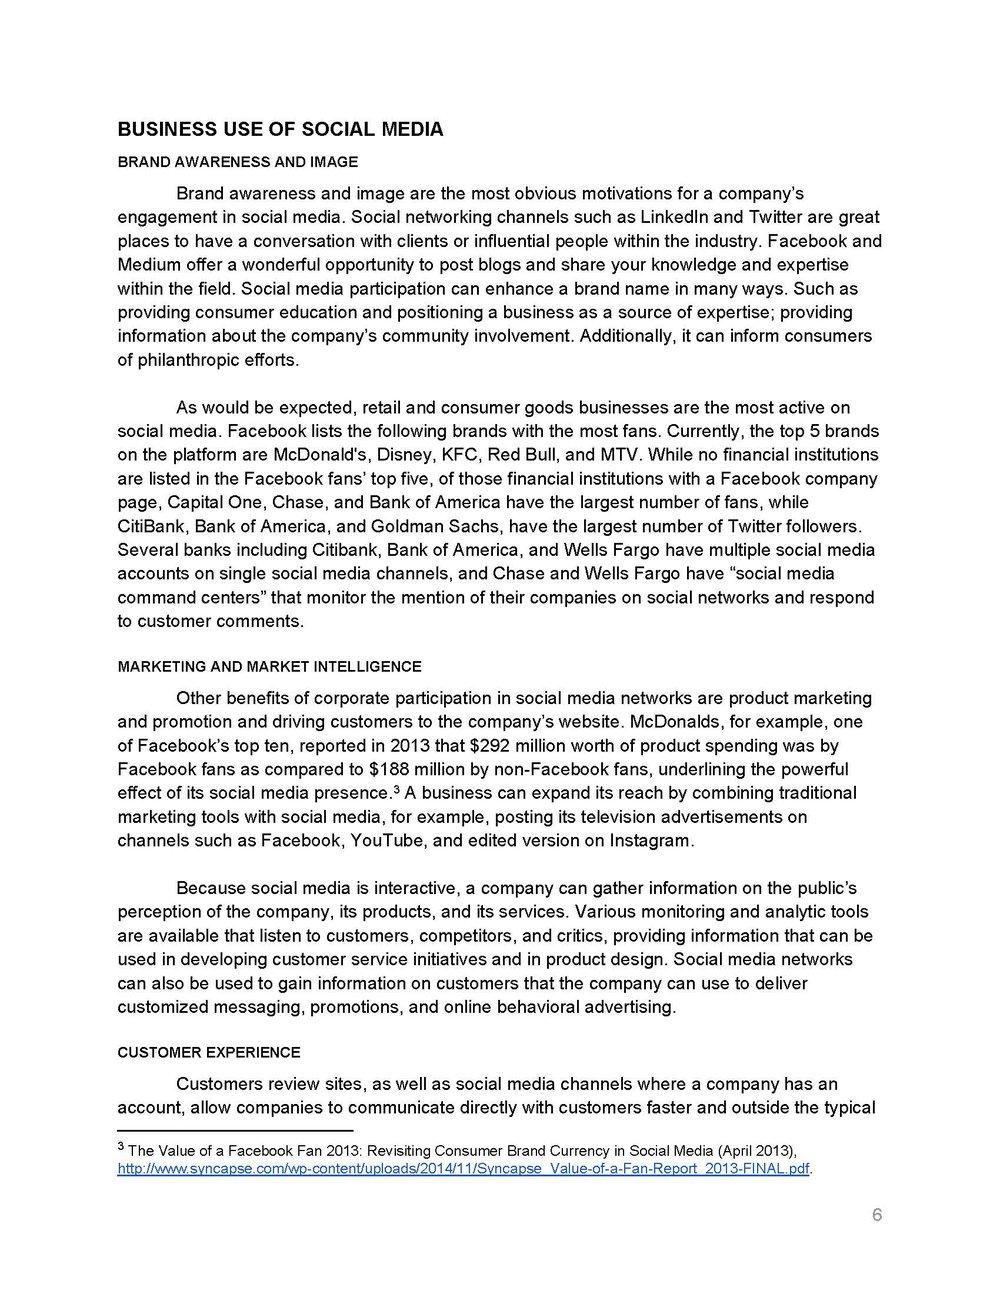 Amity Financial - Social Media White Paper_Page_07.jpg